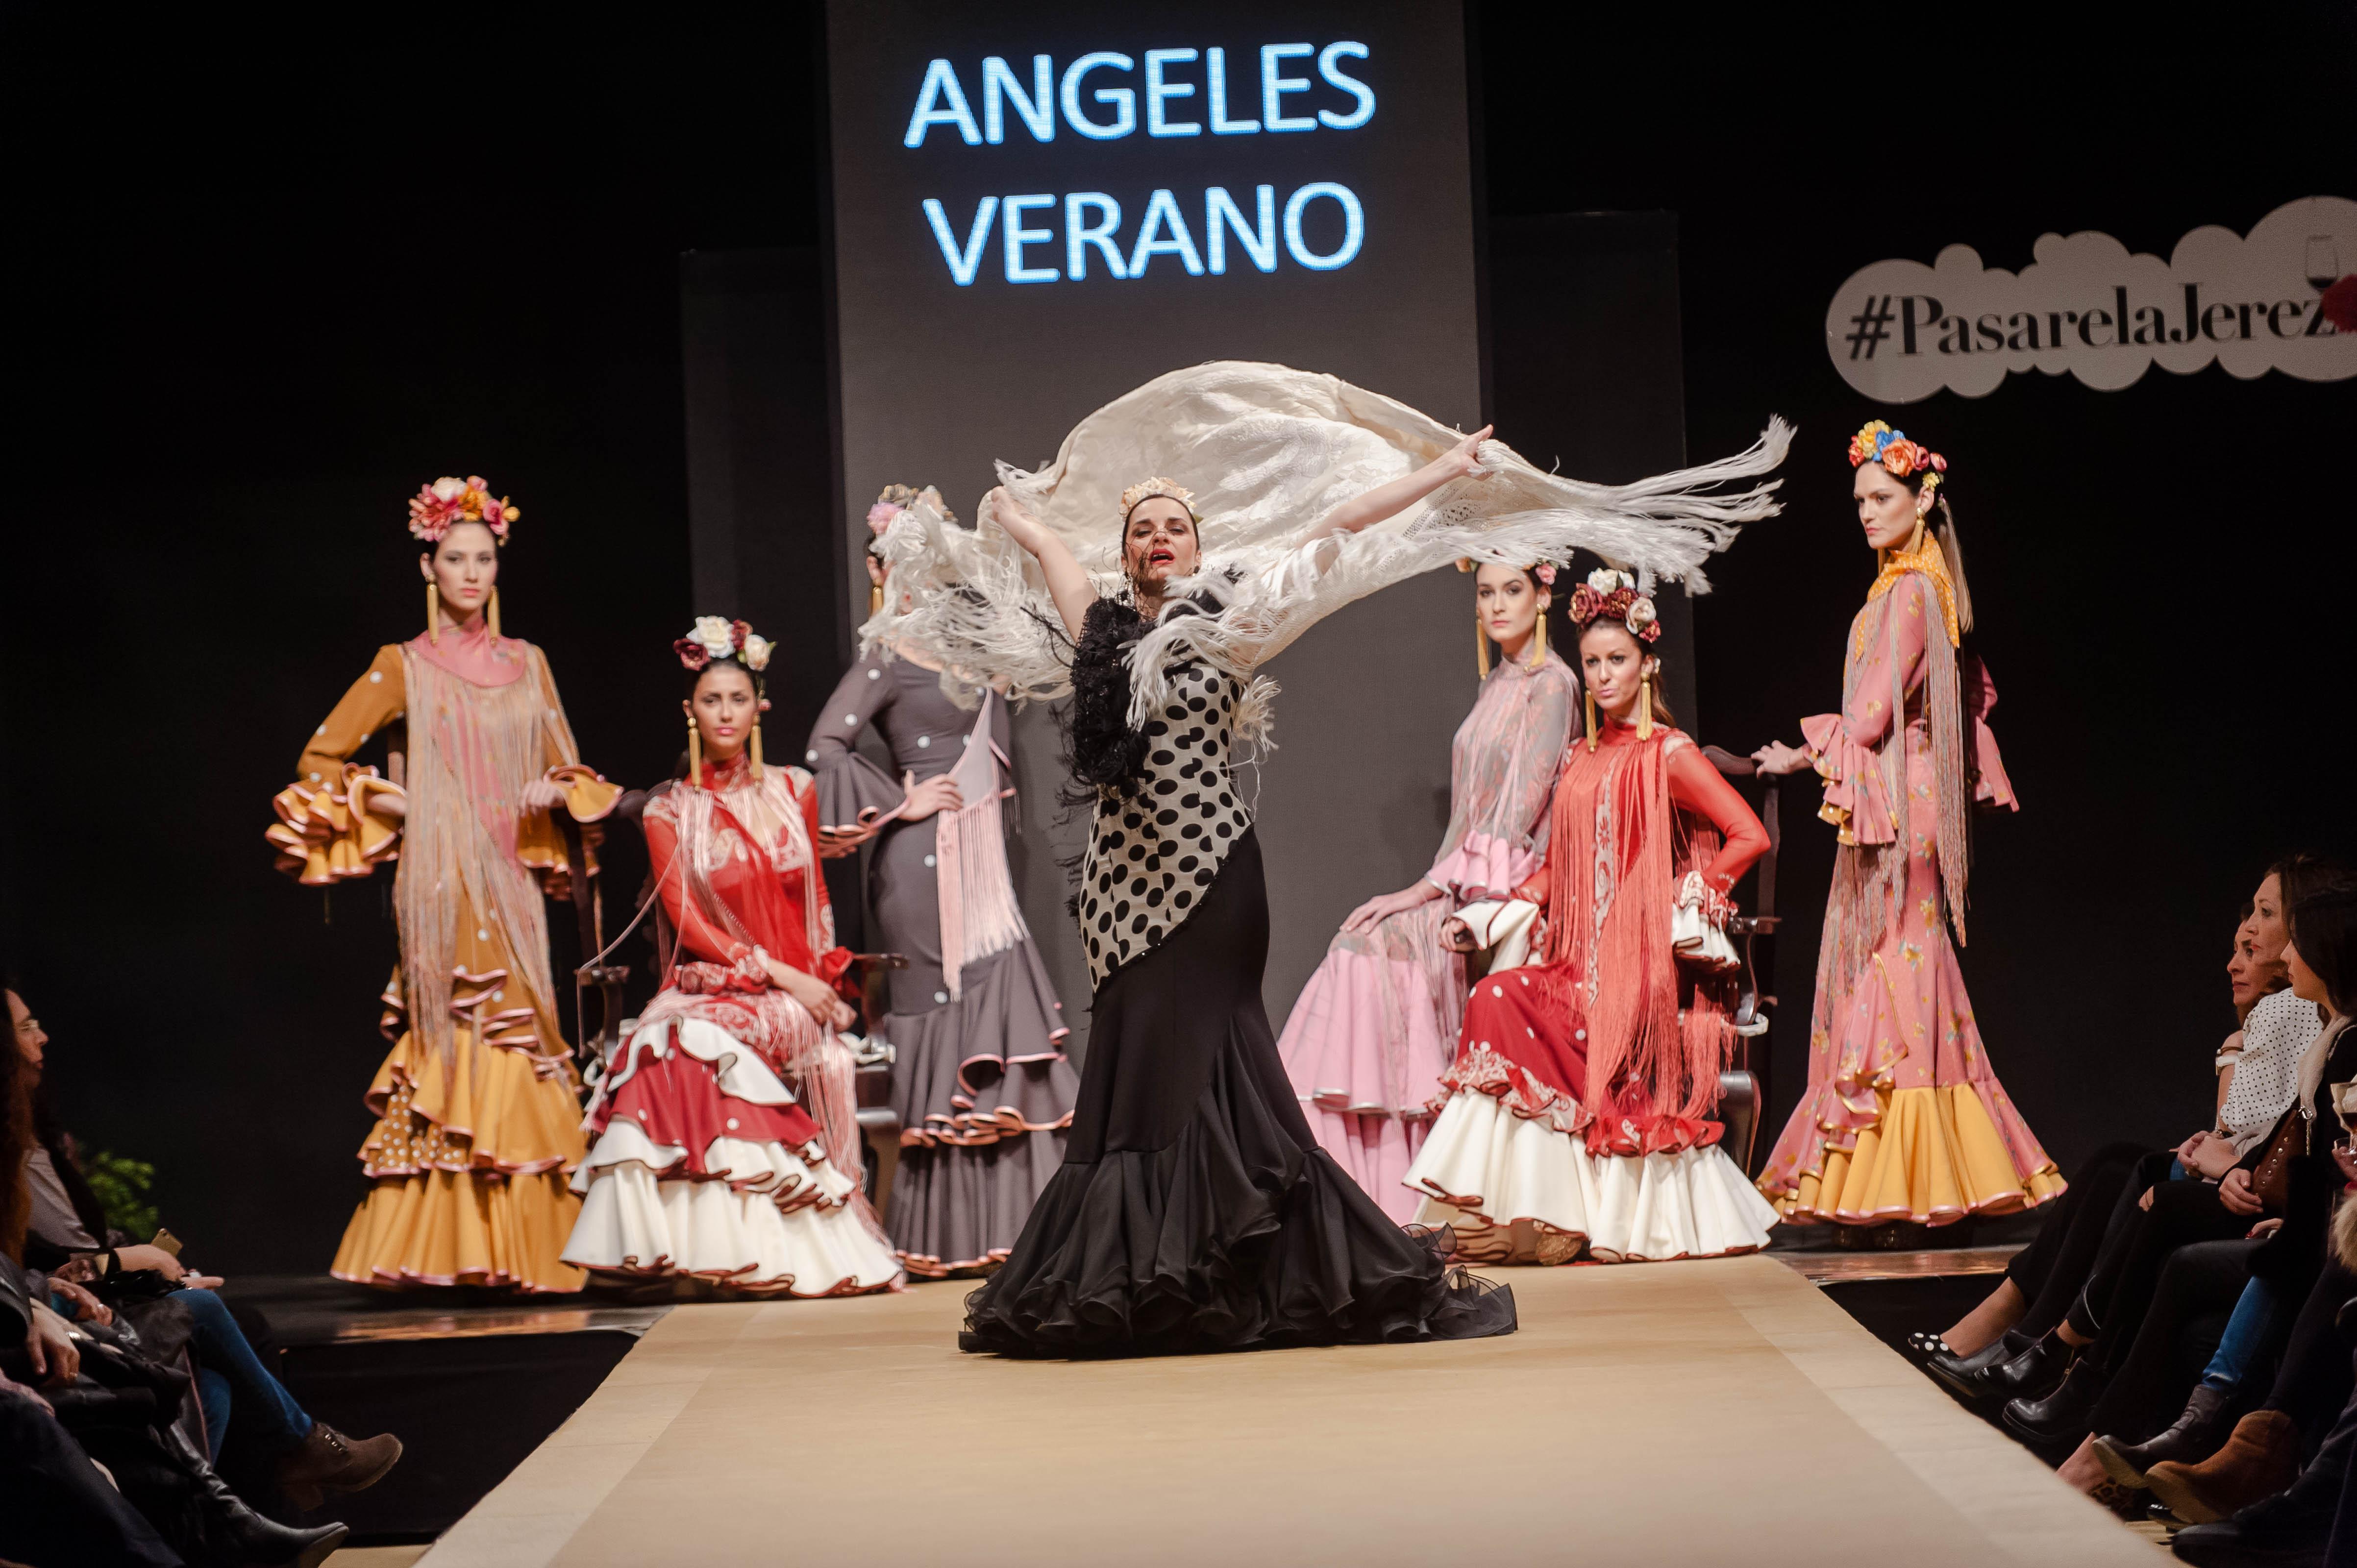 DesfileAngelesVerano_011